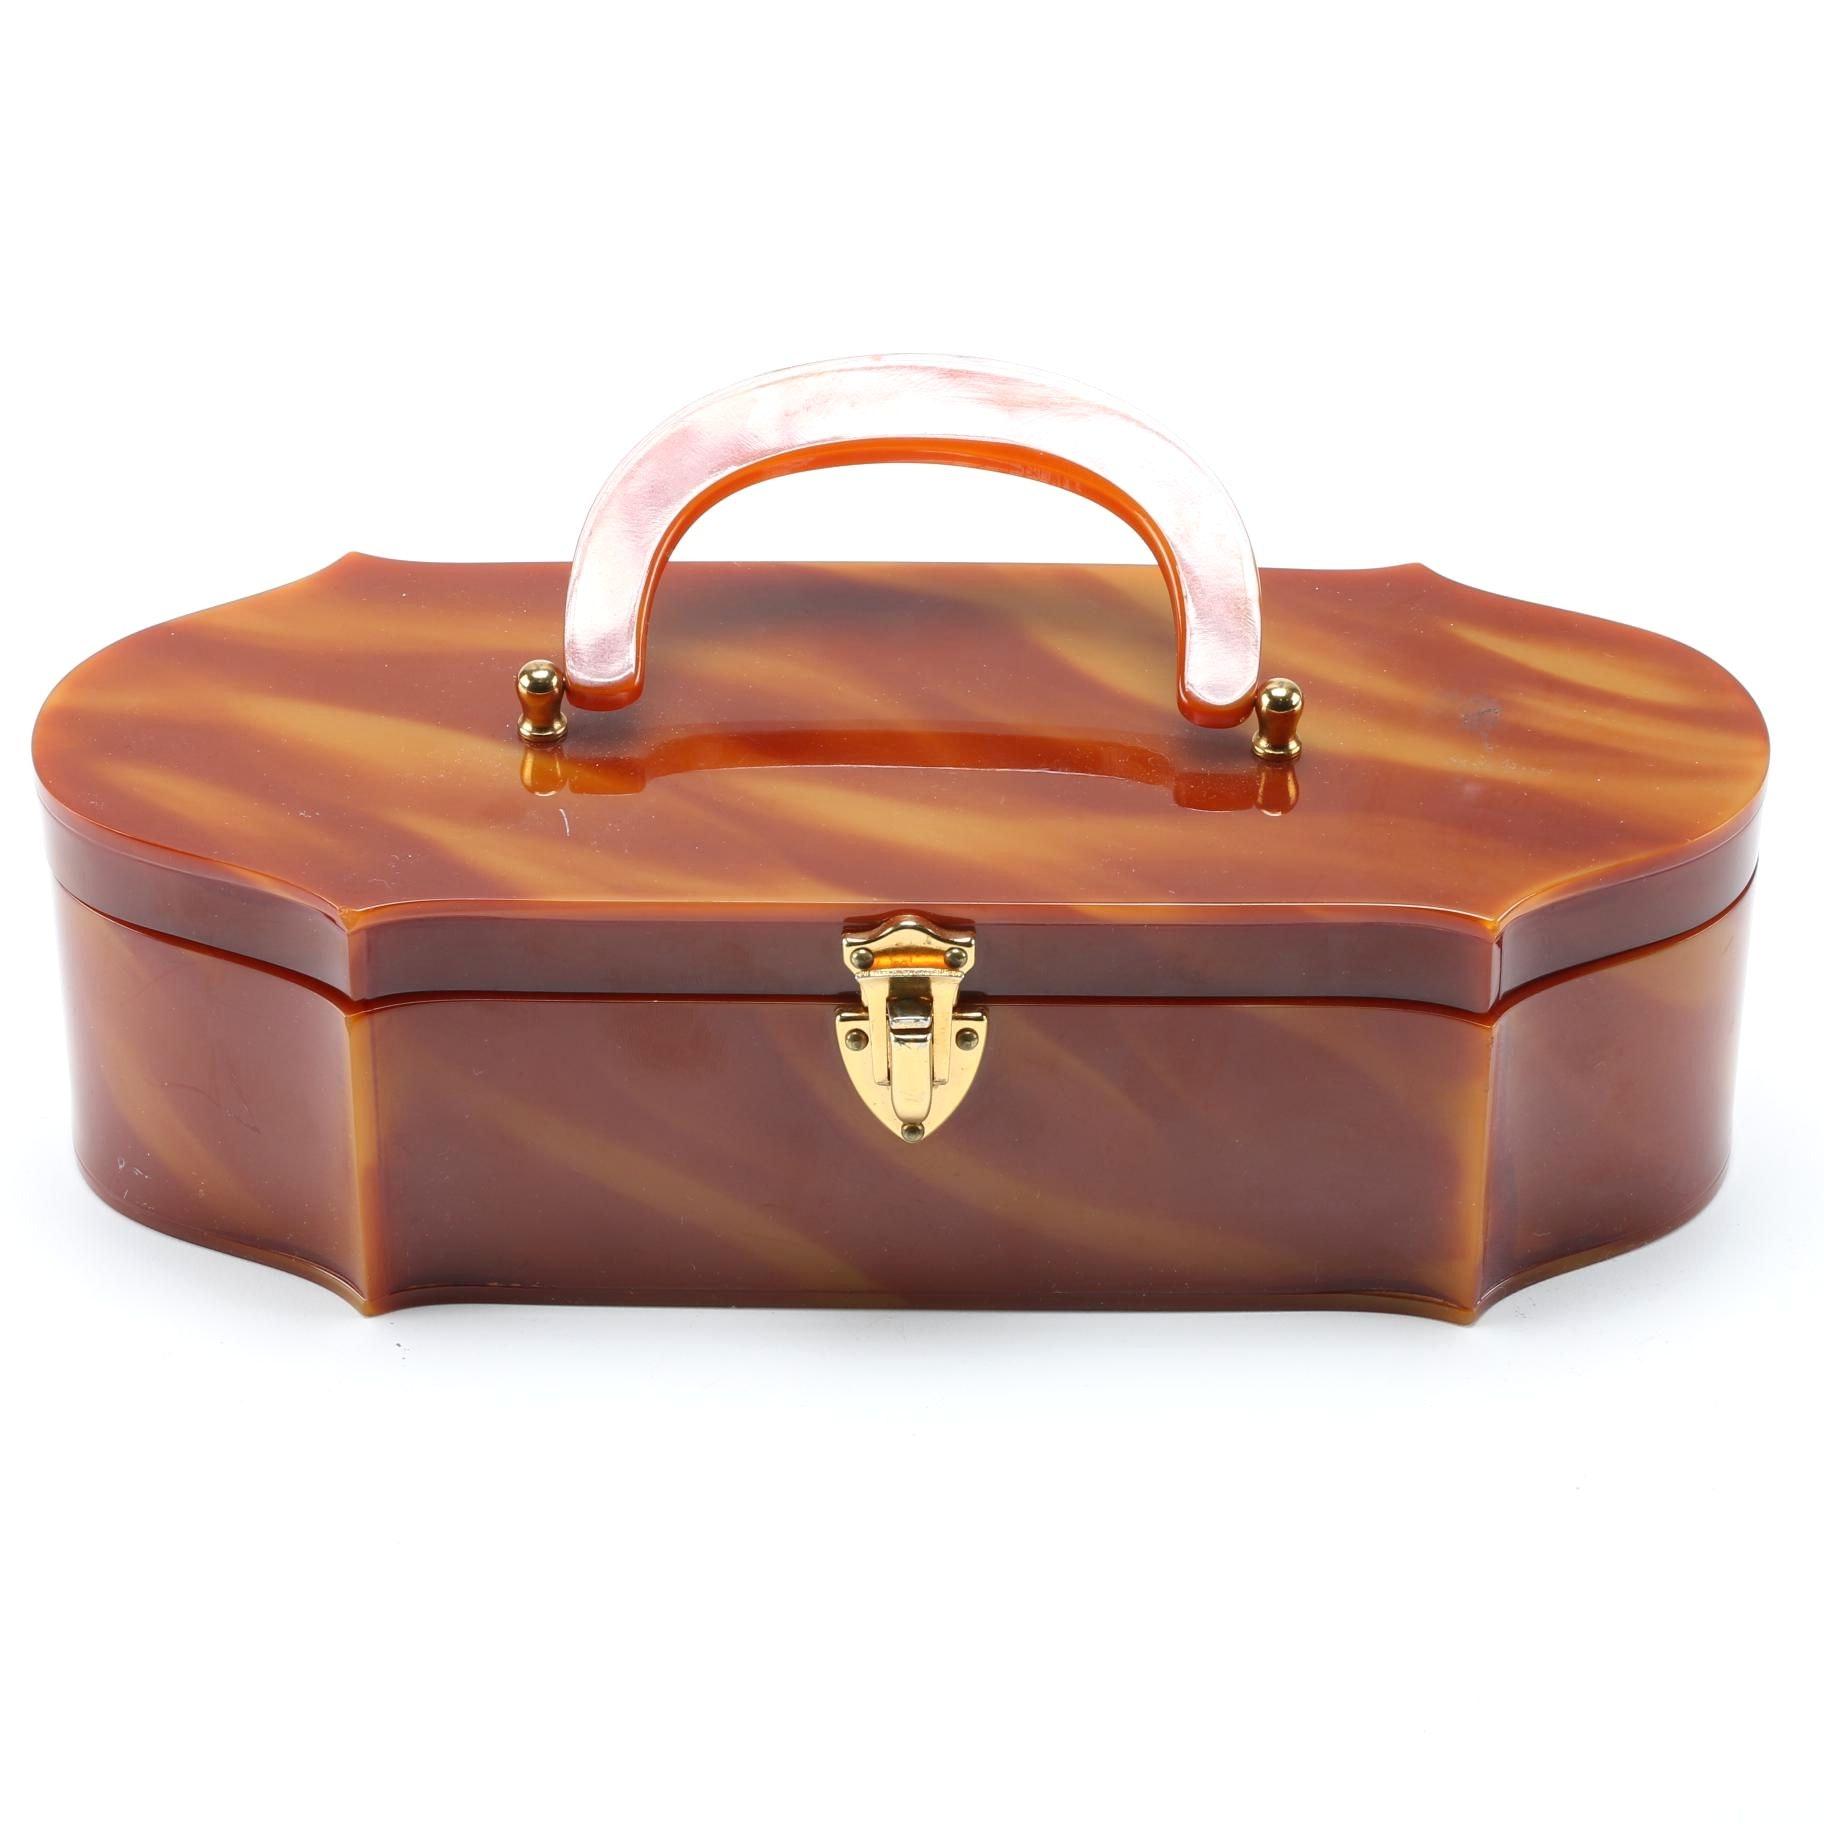 Wilardy Bakelite Box Purse